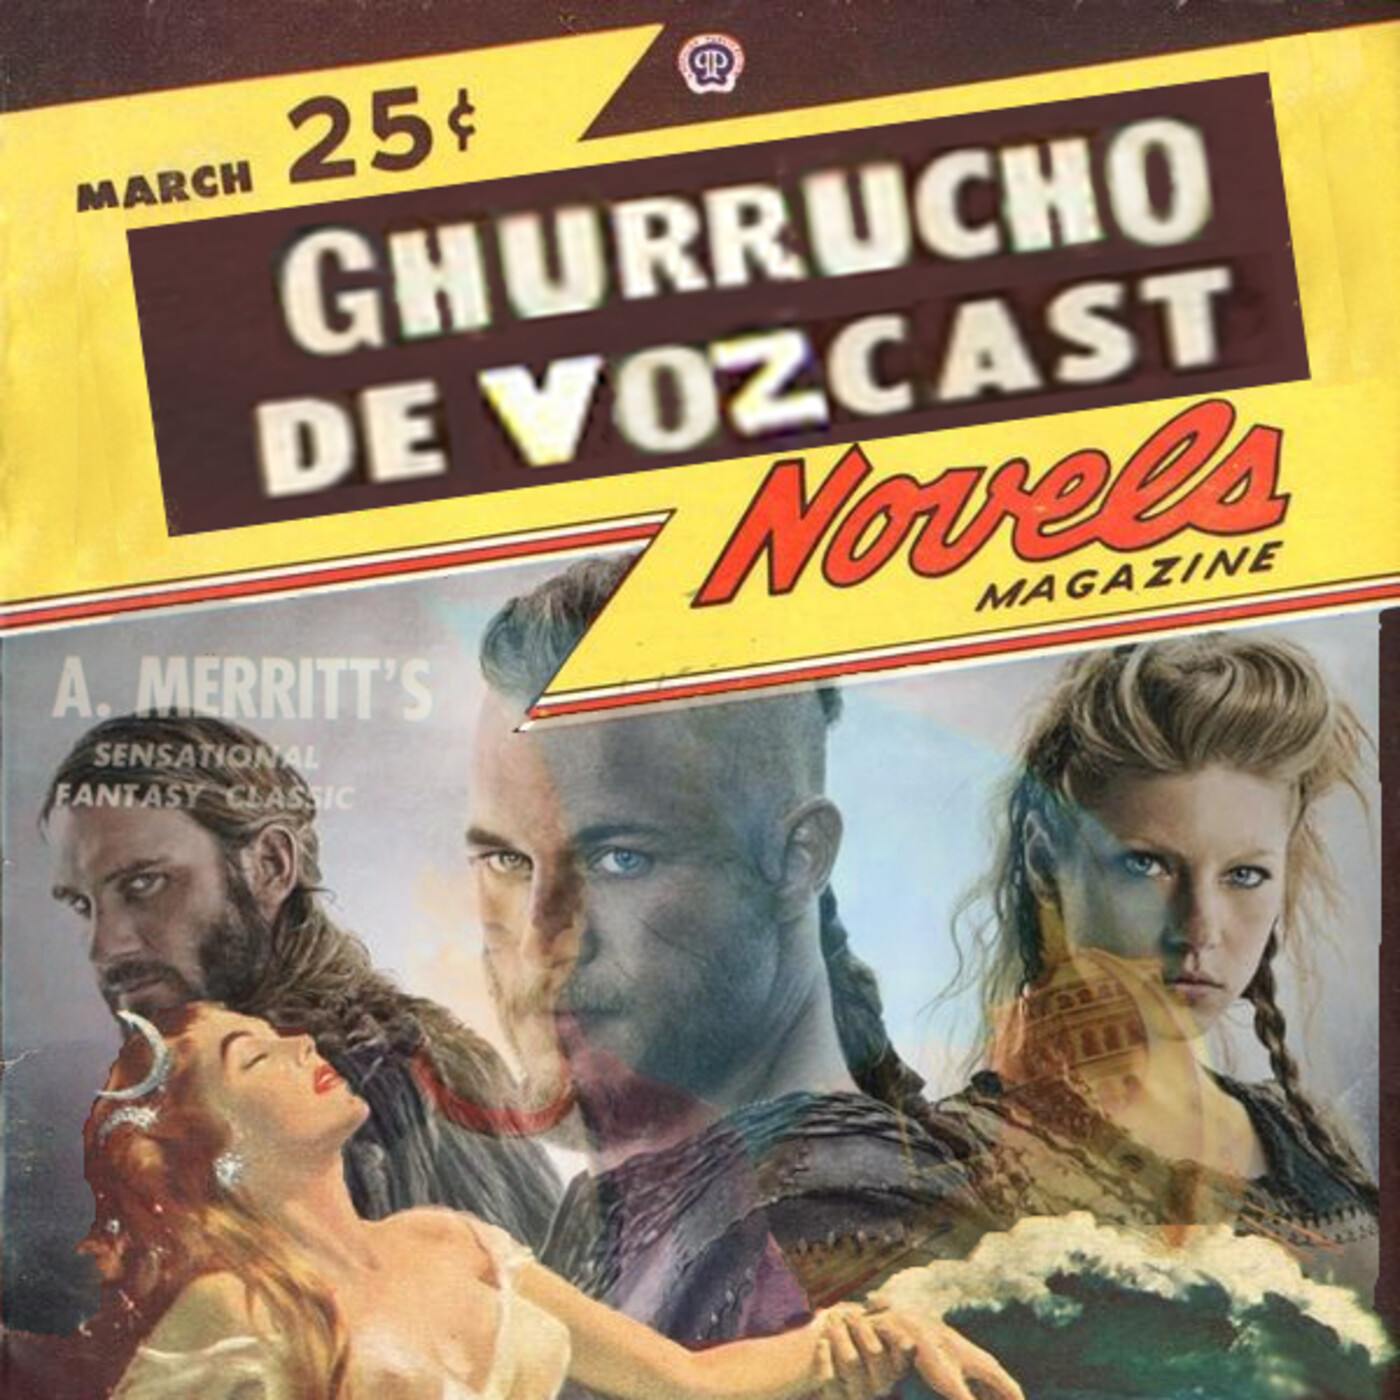 Gurrucho Vikings e Viquingos. Podcast en galego